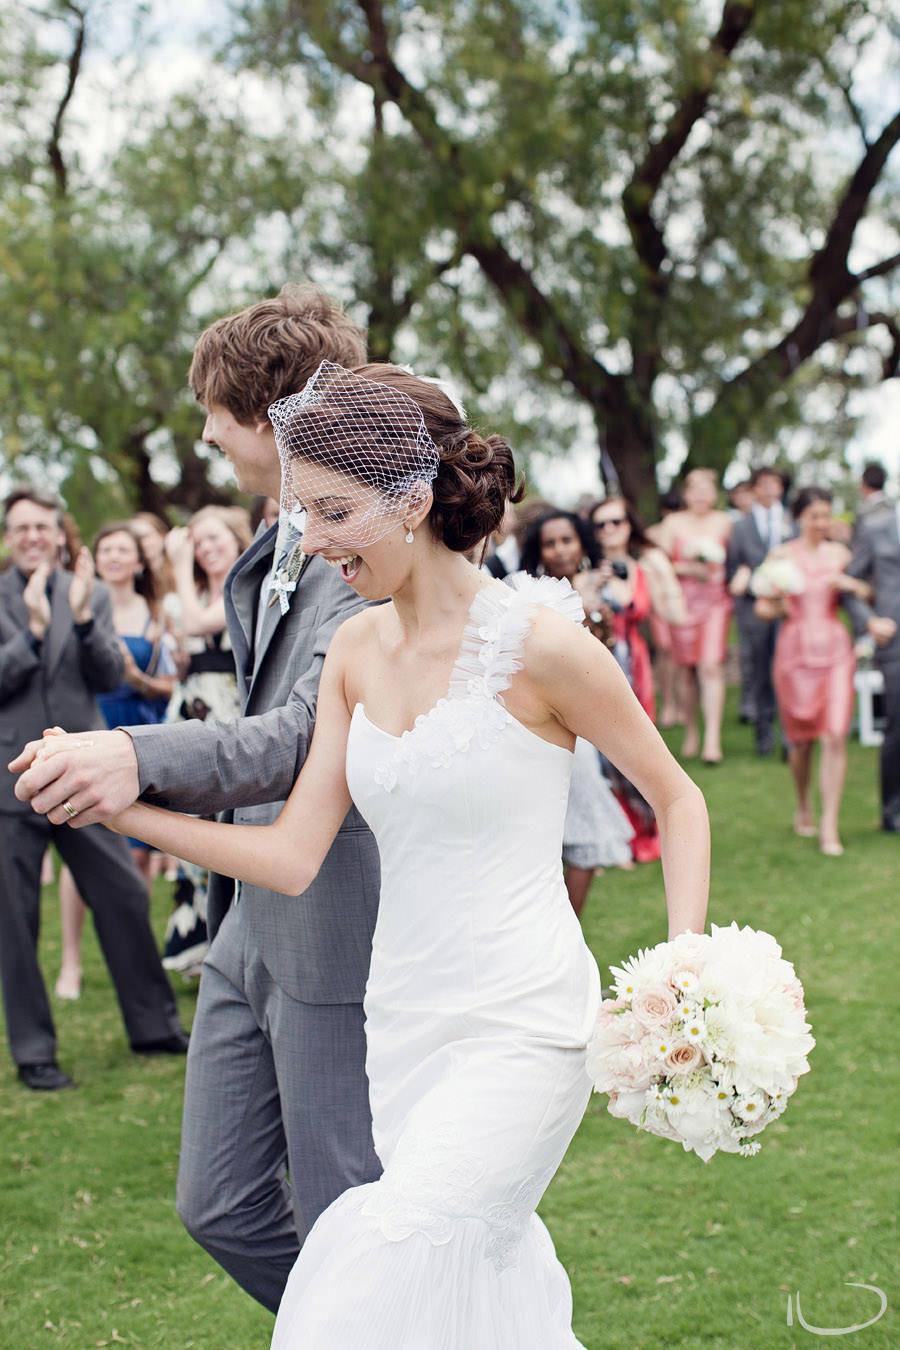 Sydney Wedding Photographer: Bride & Groom walking down the aisle